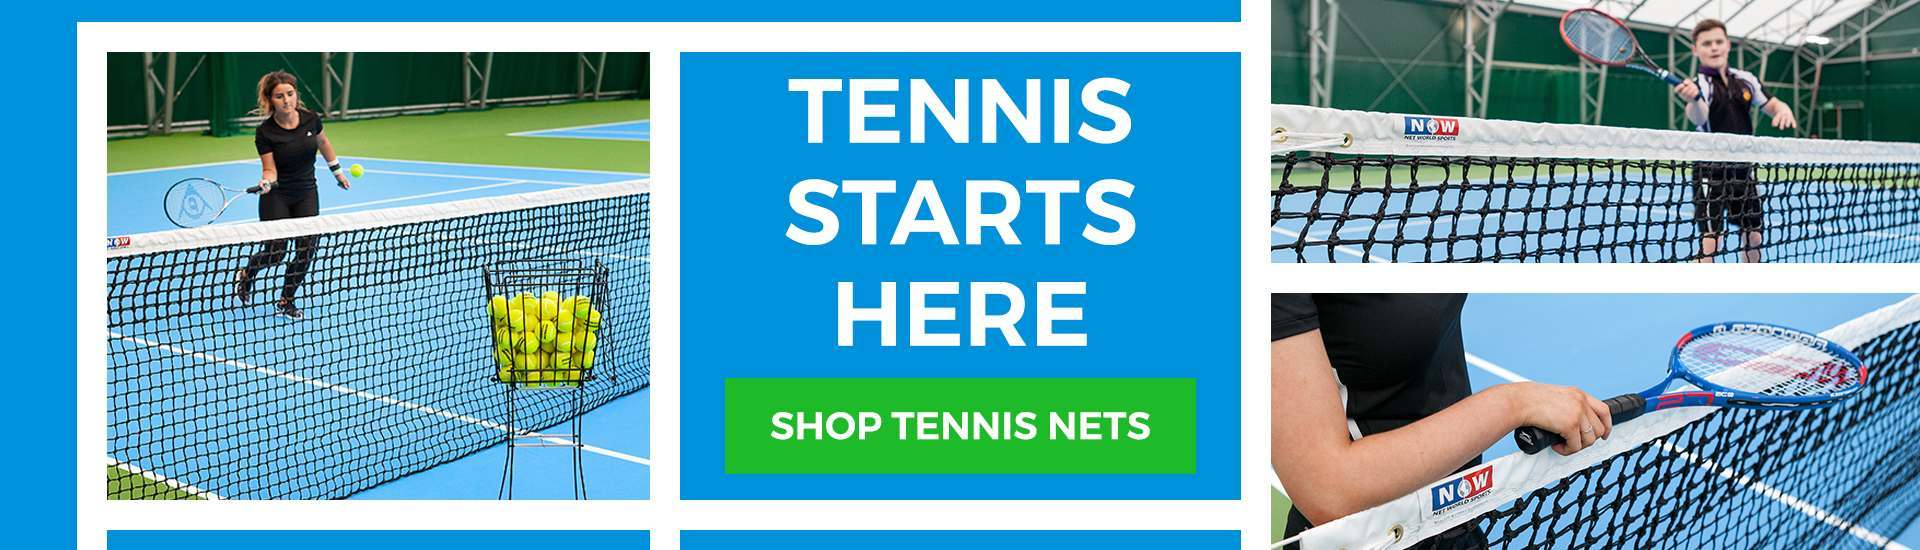 Tennis Starts Here